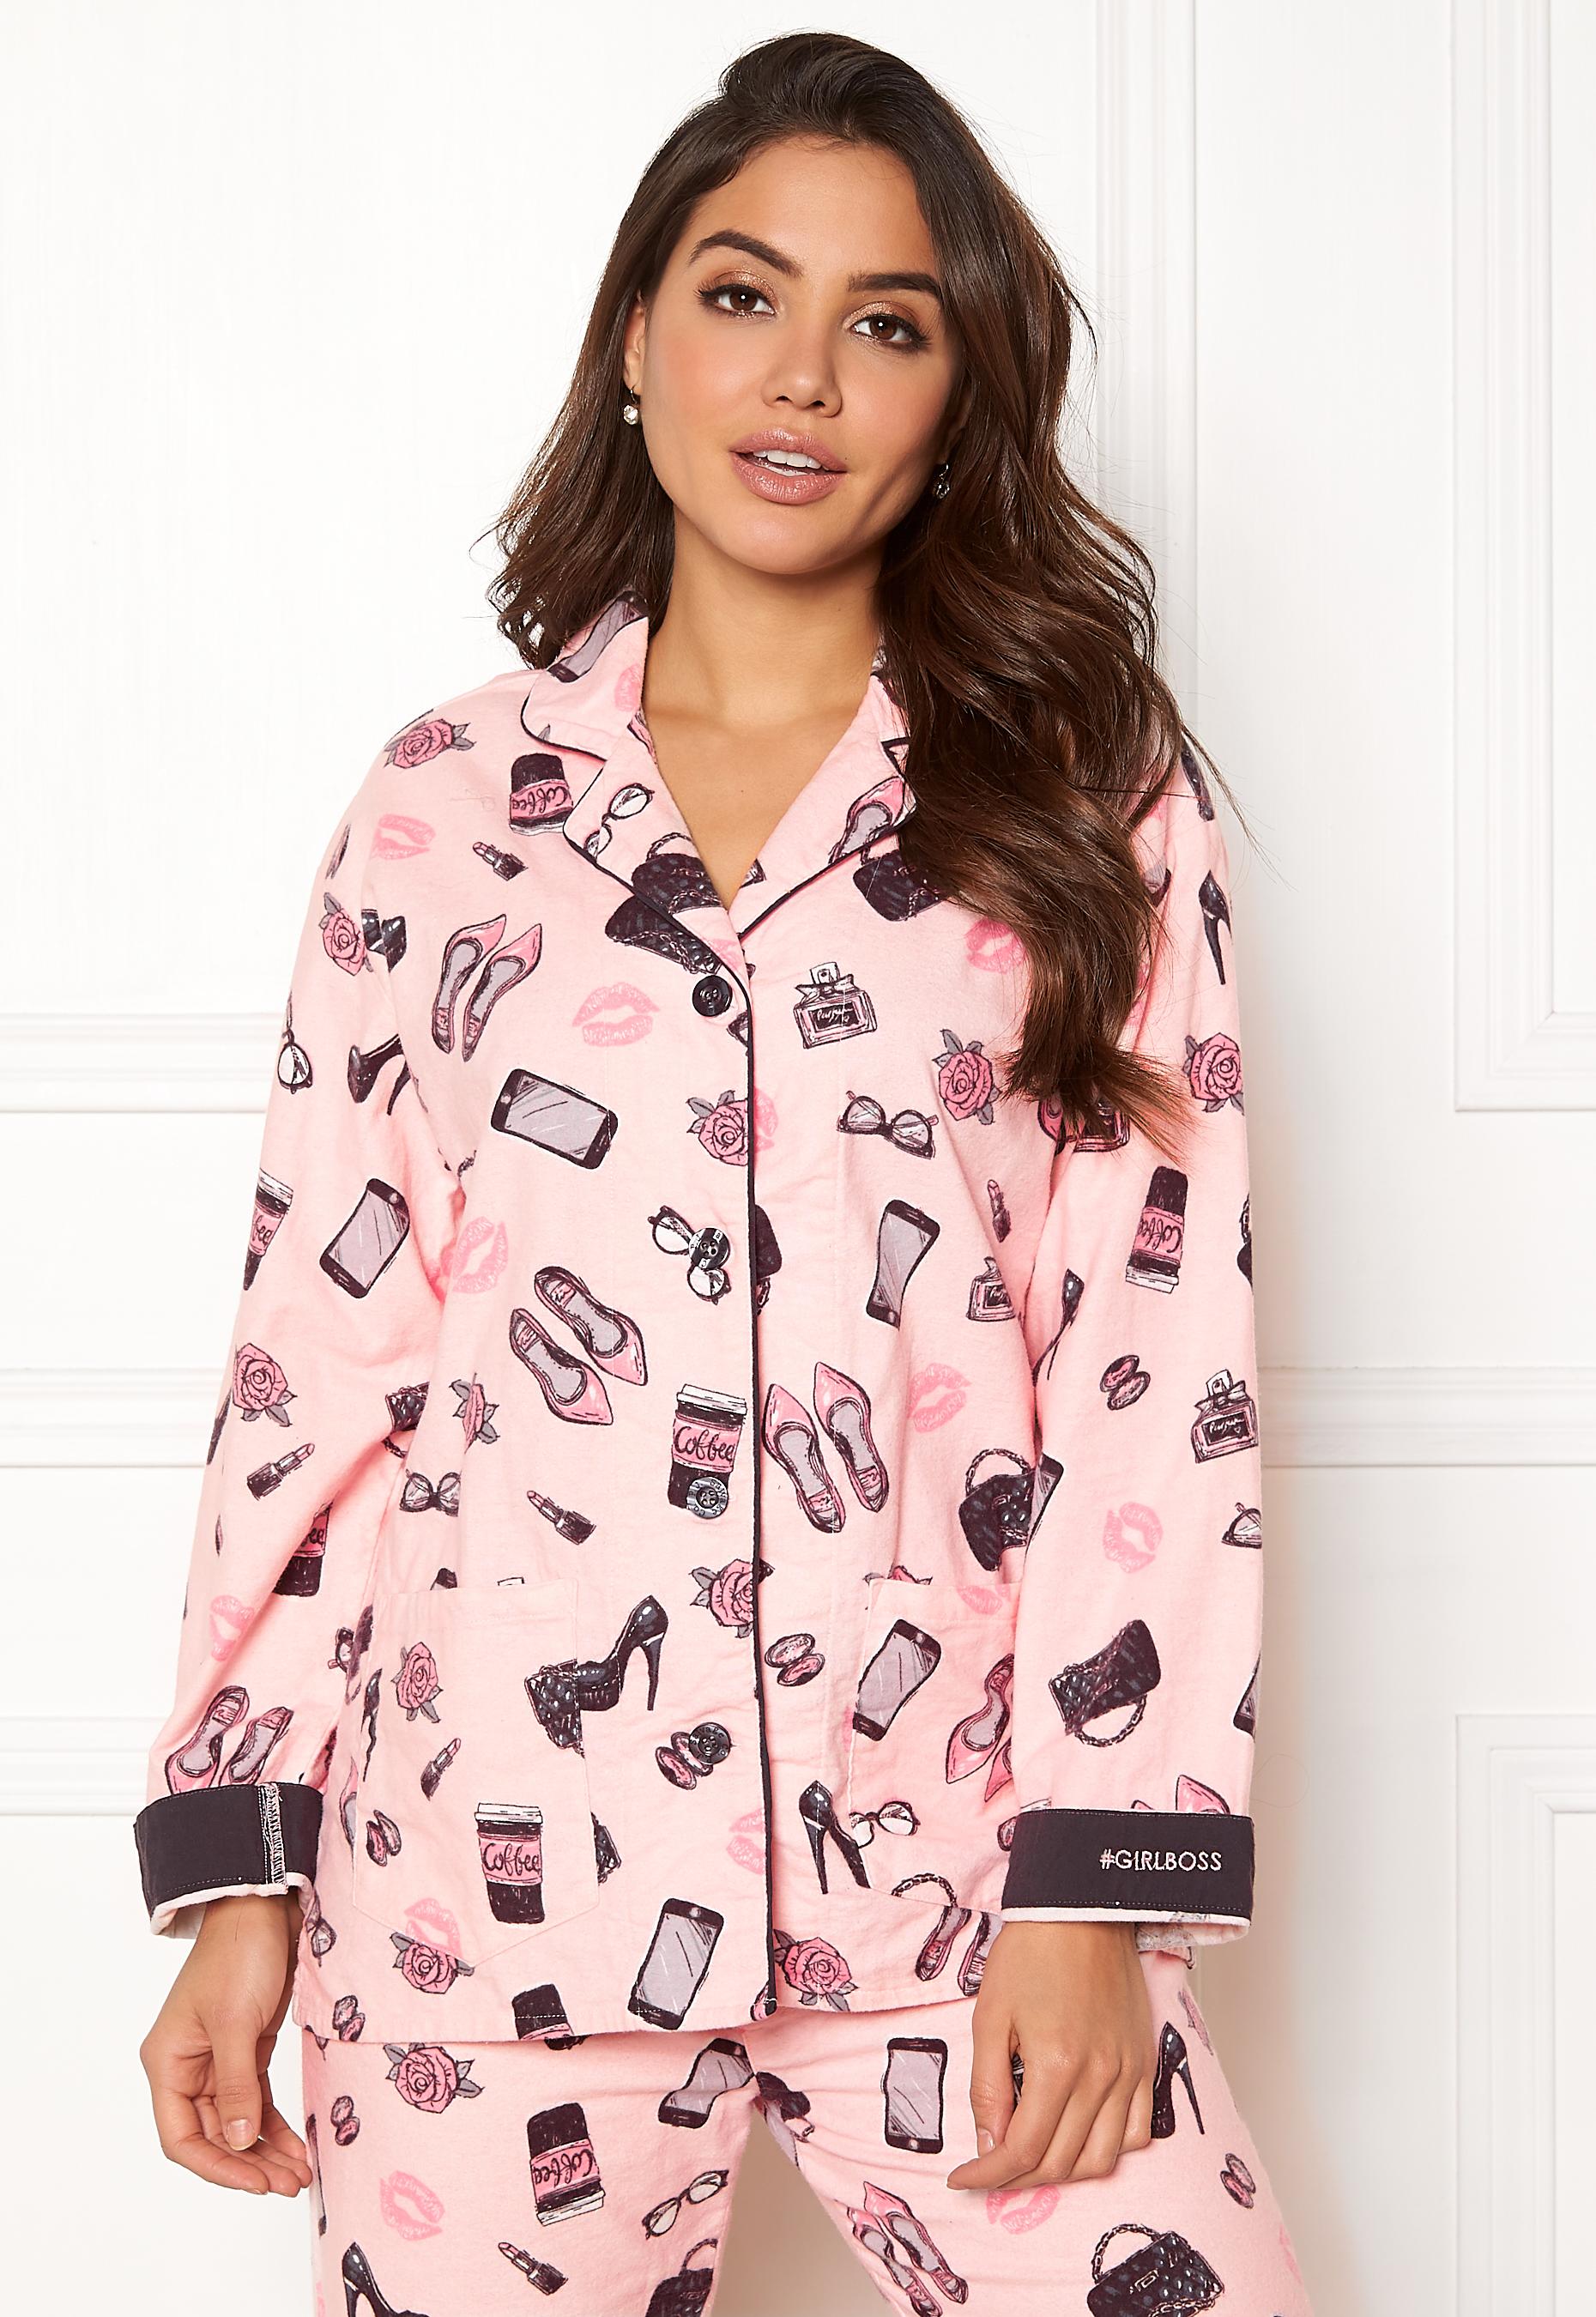 7e9c01fe PJ. Salvage PJ Flannel Set Pink - Bubbleroom